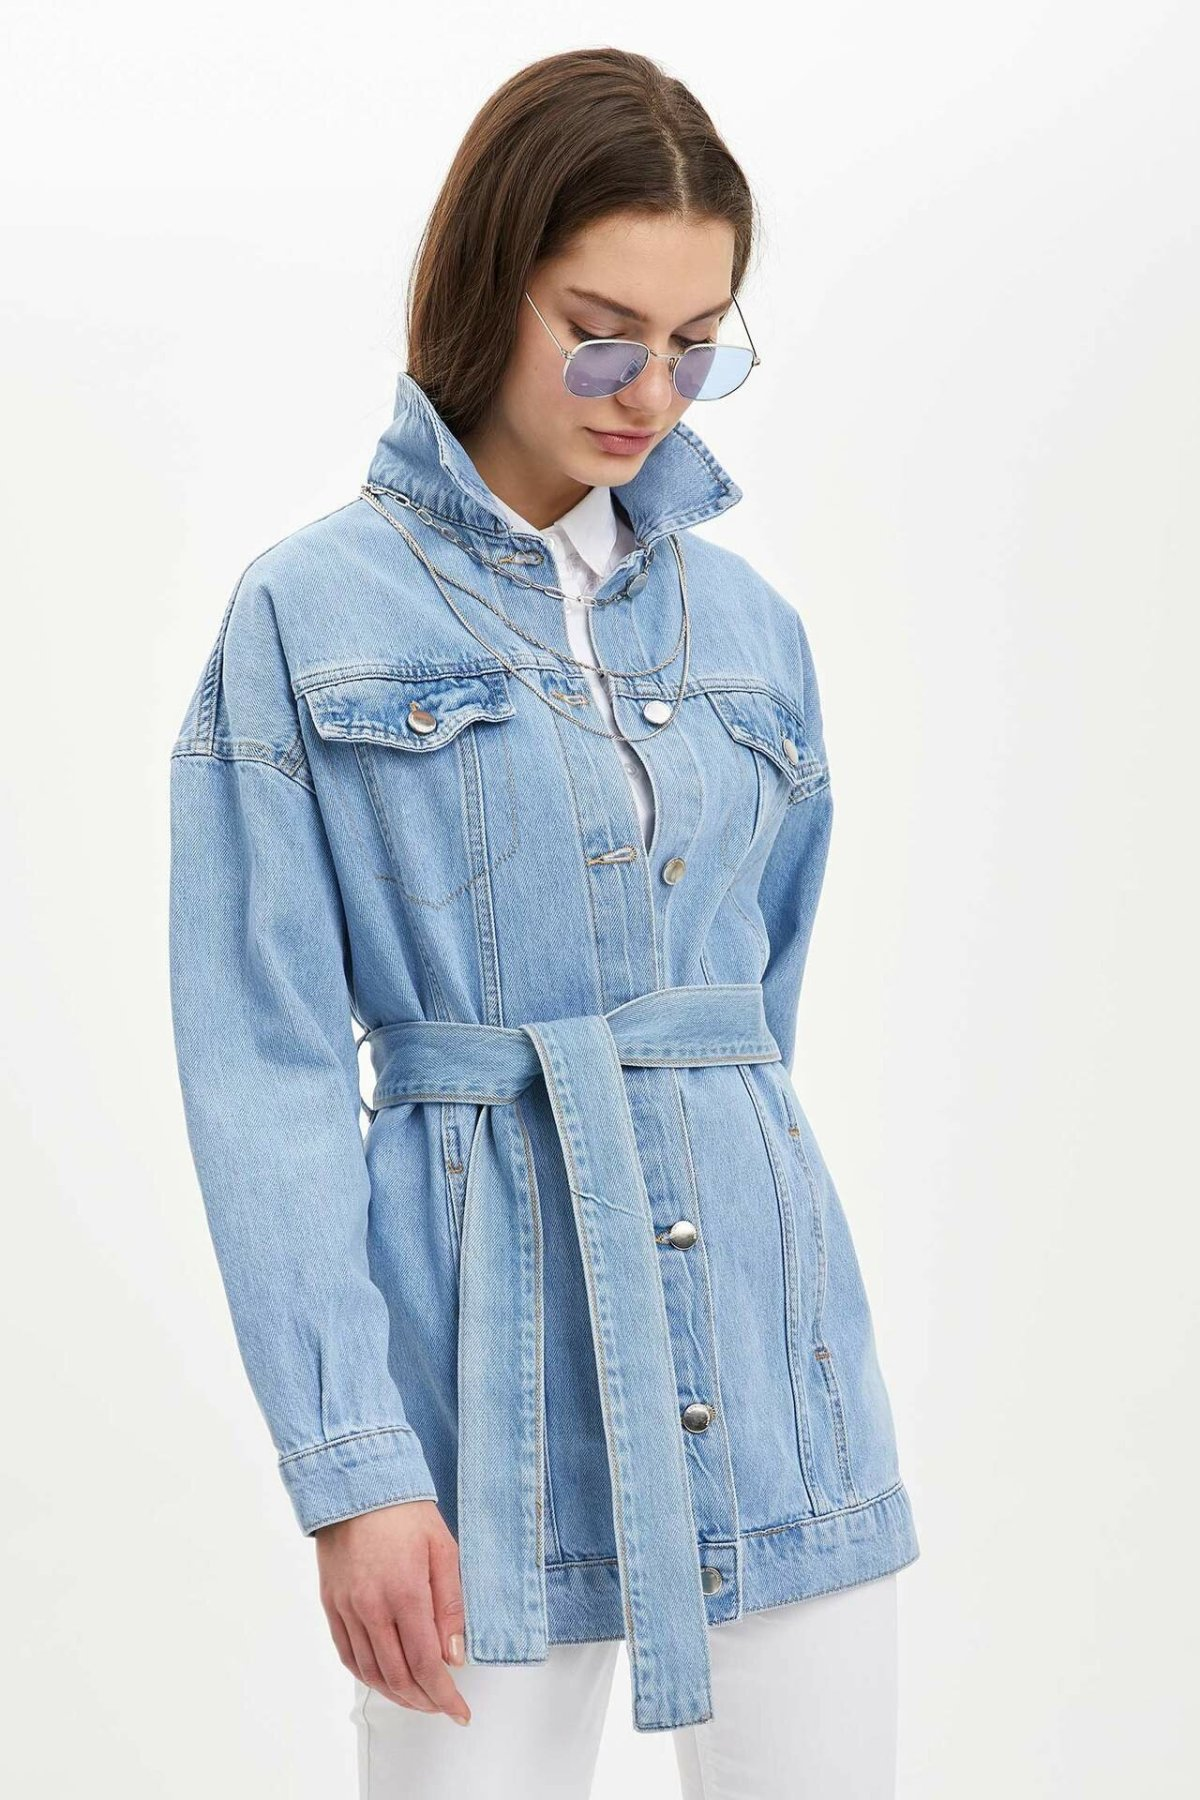 DeFacto Woman Spring Light Blue Denim Jackets Women Casual Belt Denim Coats Women Stylish Jacket-L7586AZ20SP